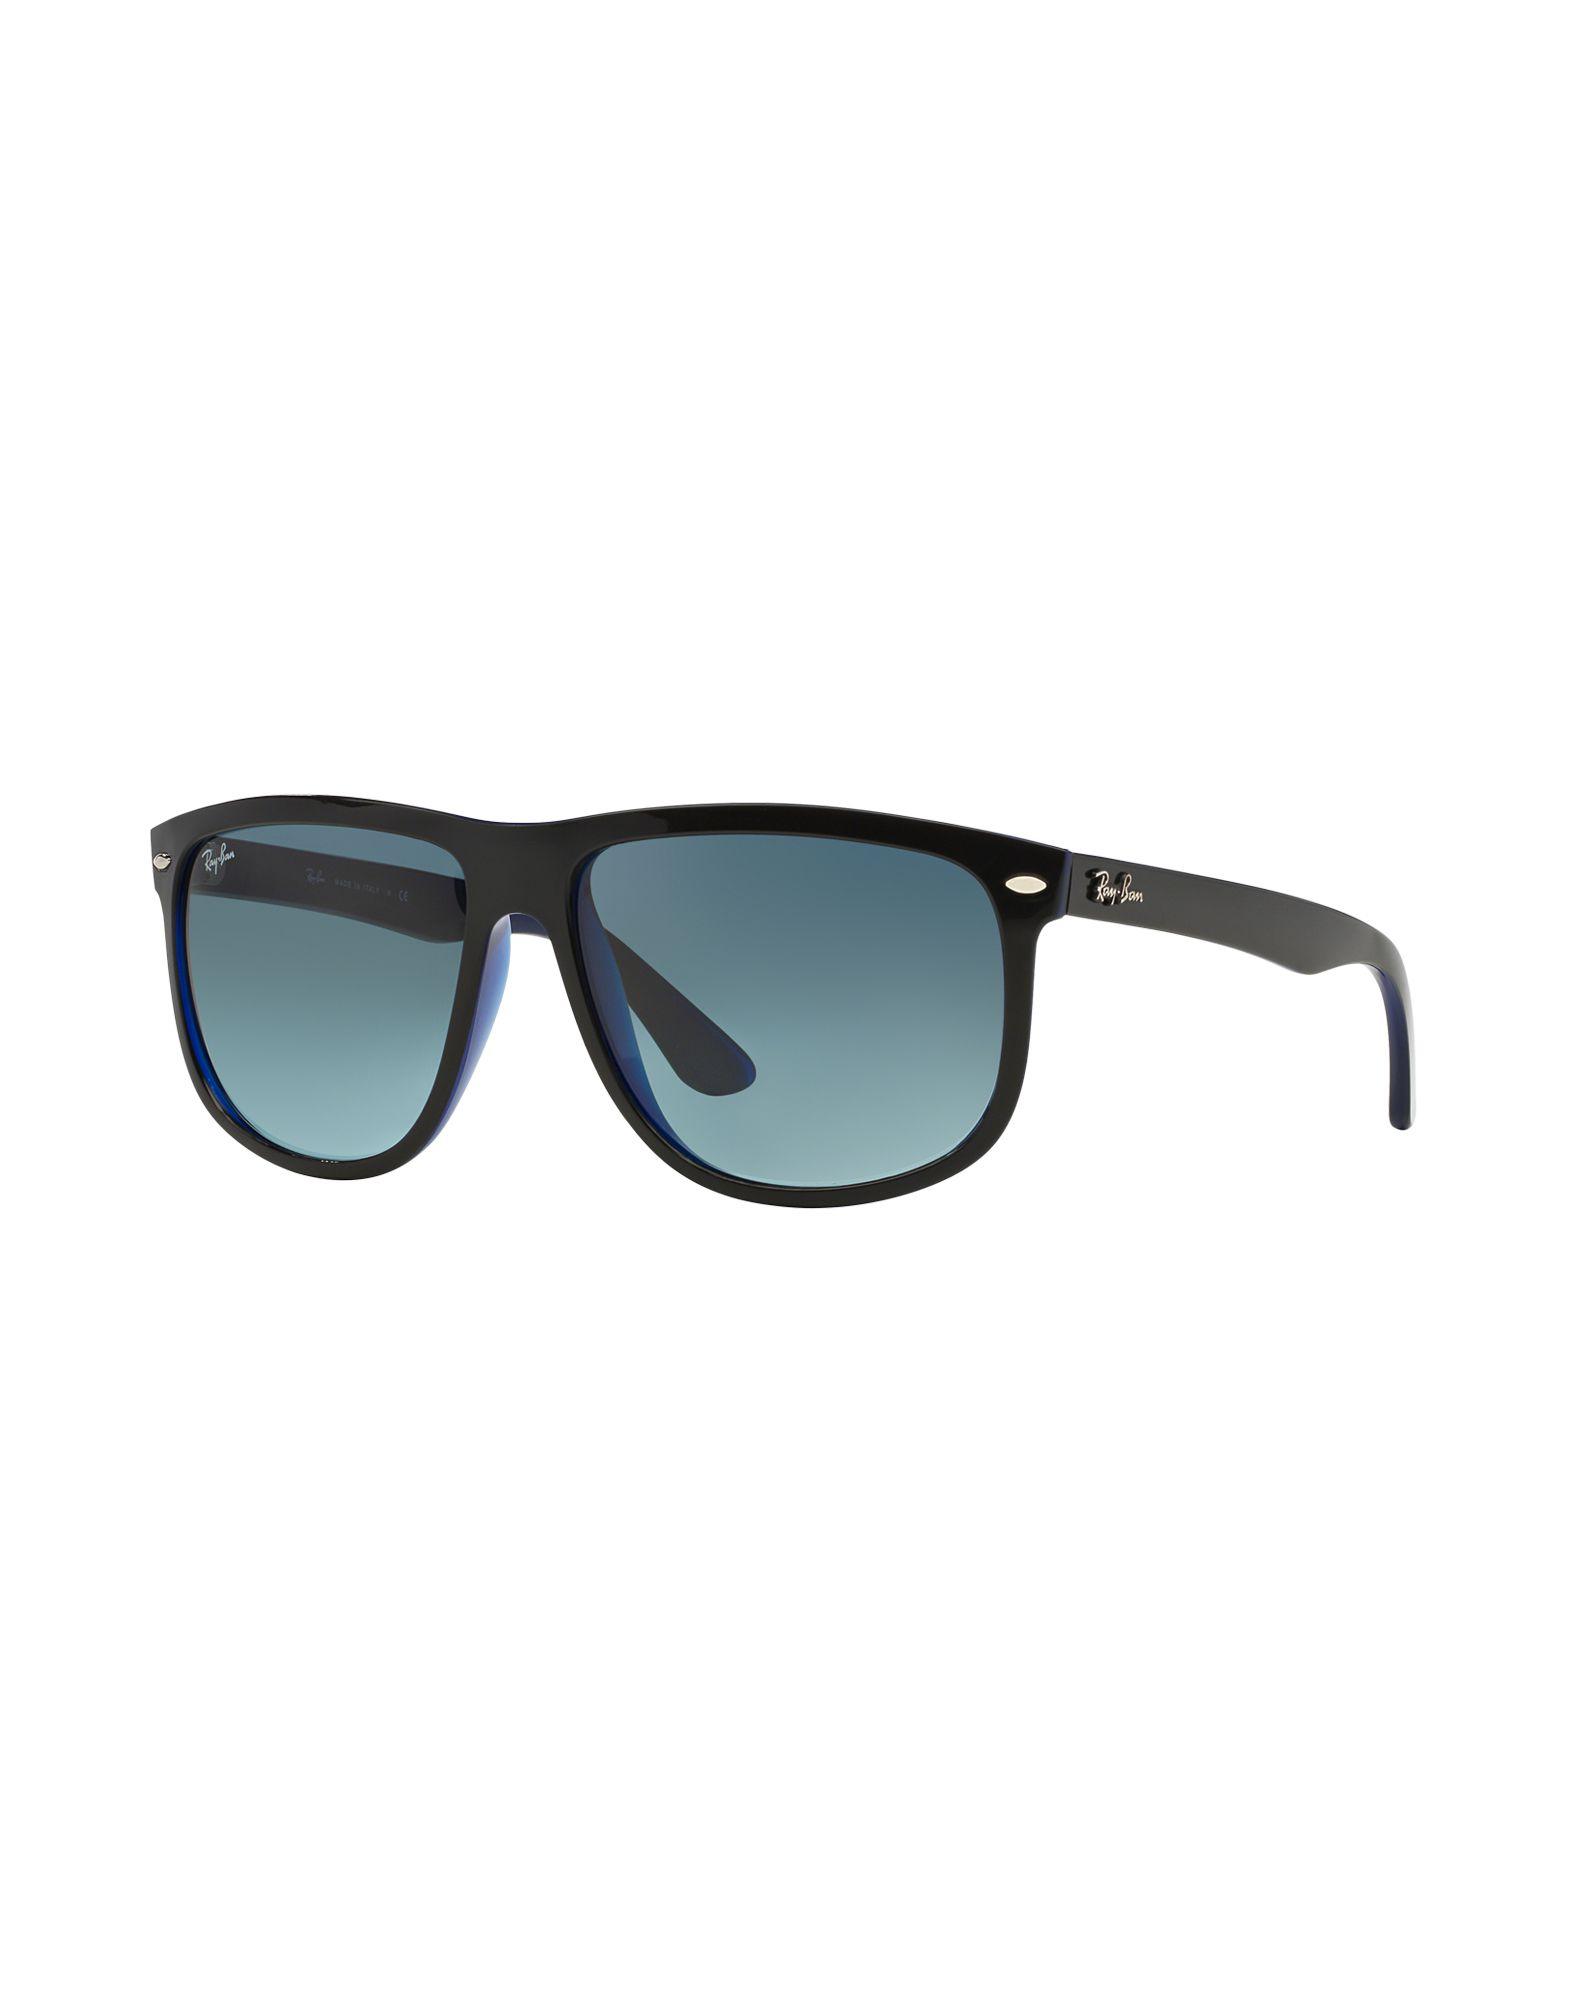 014eae4207cc Ray Ban Girl Sunglasses